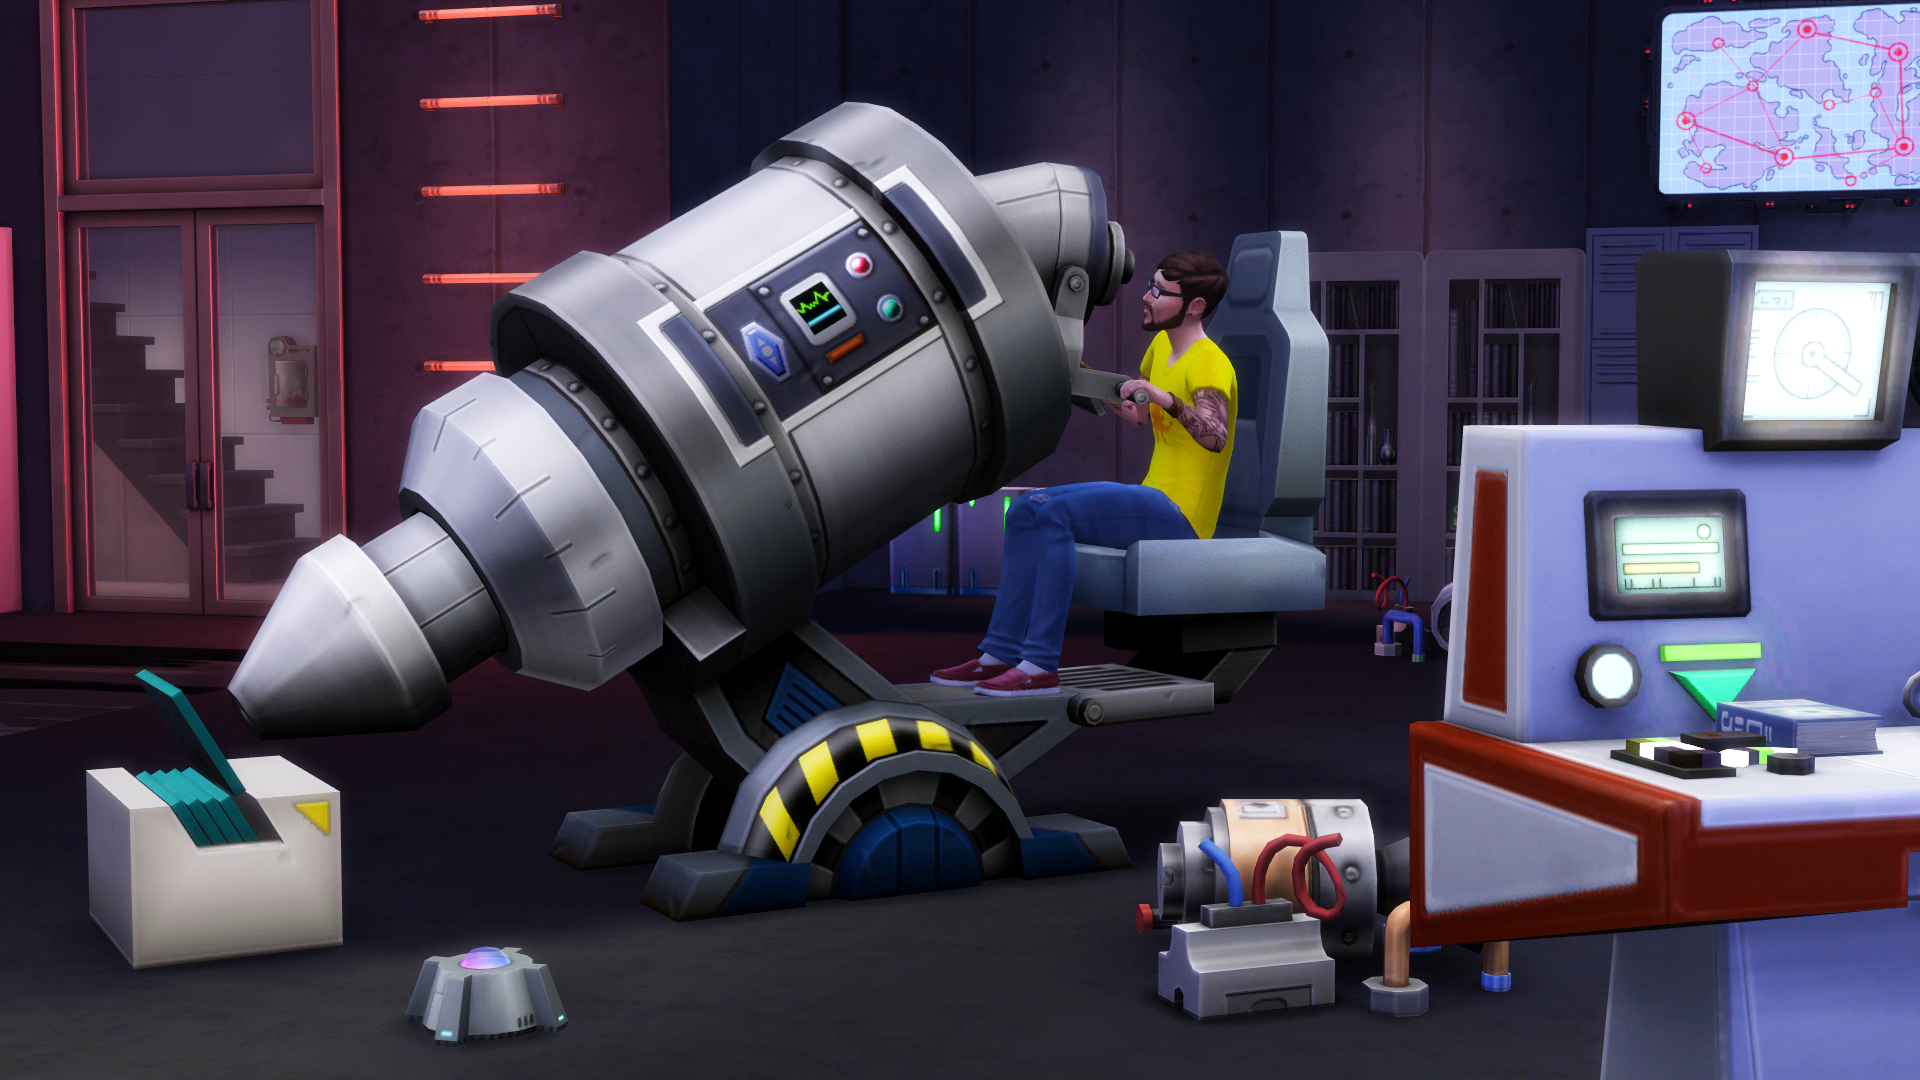 [Noticia]Reportajes de Los Sims 4: Pekesims 14384615534_6907f20dba_o